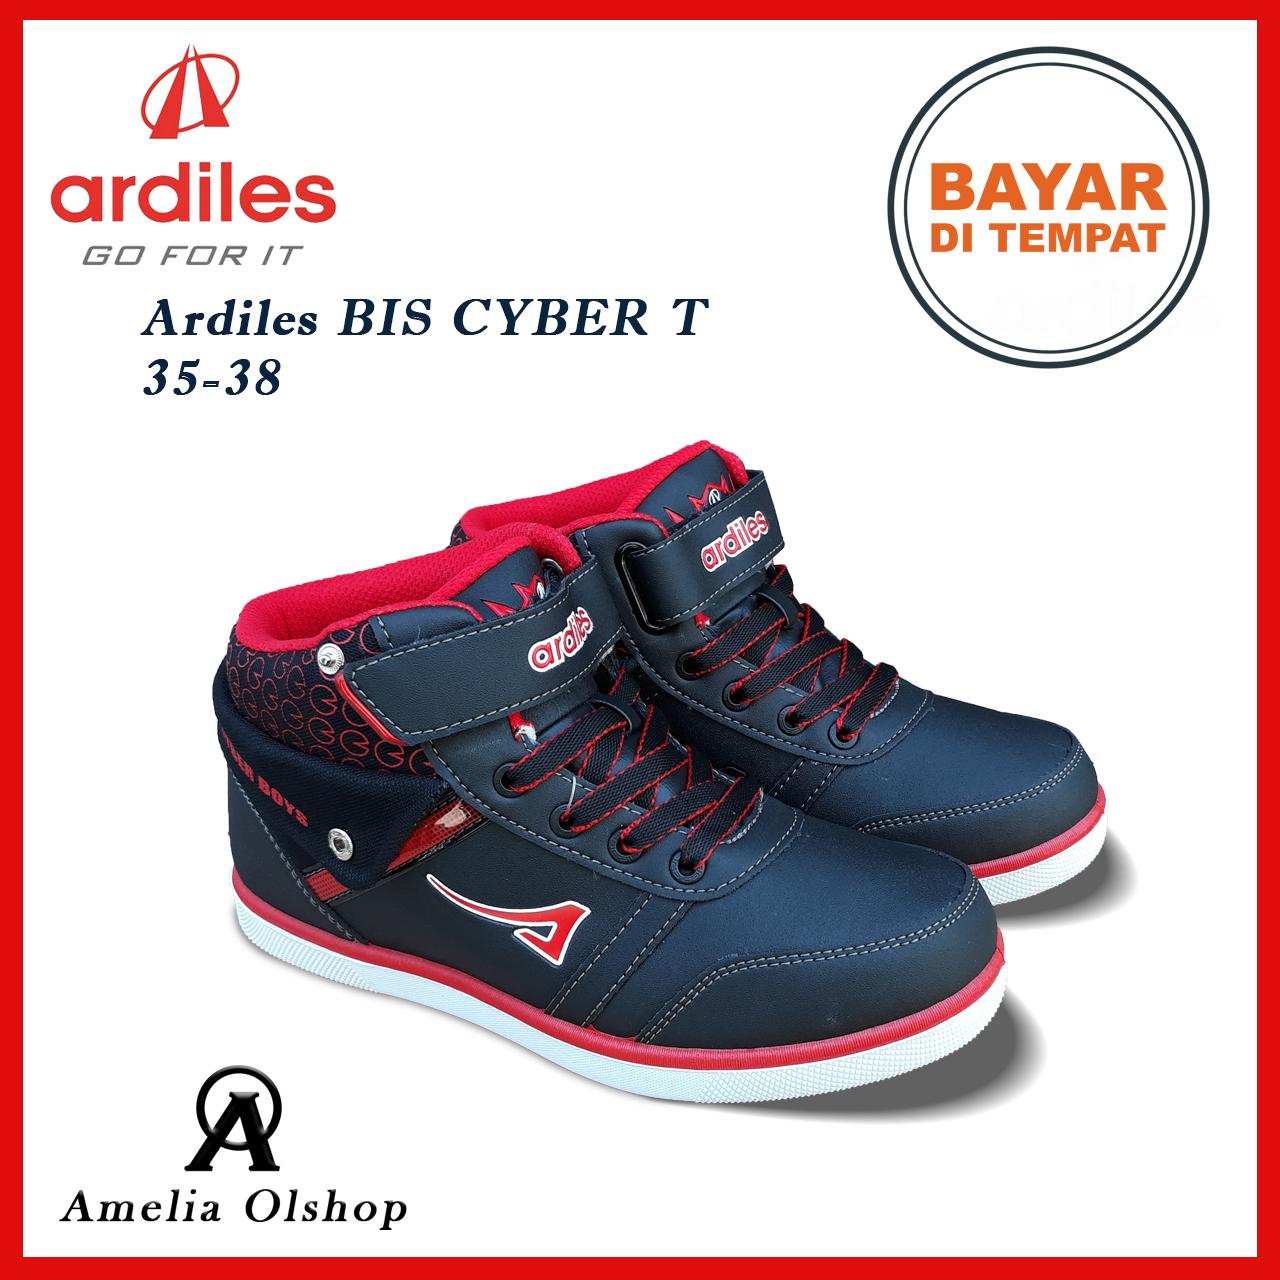 Amelia Olshop - Sepatu Sekolah Ardiles Cyber T 35-38 / Sepatu Sekolah Anak /